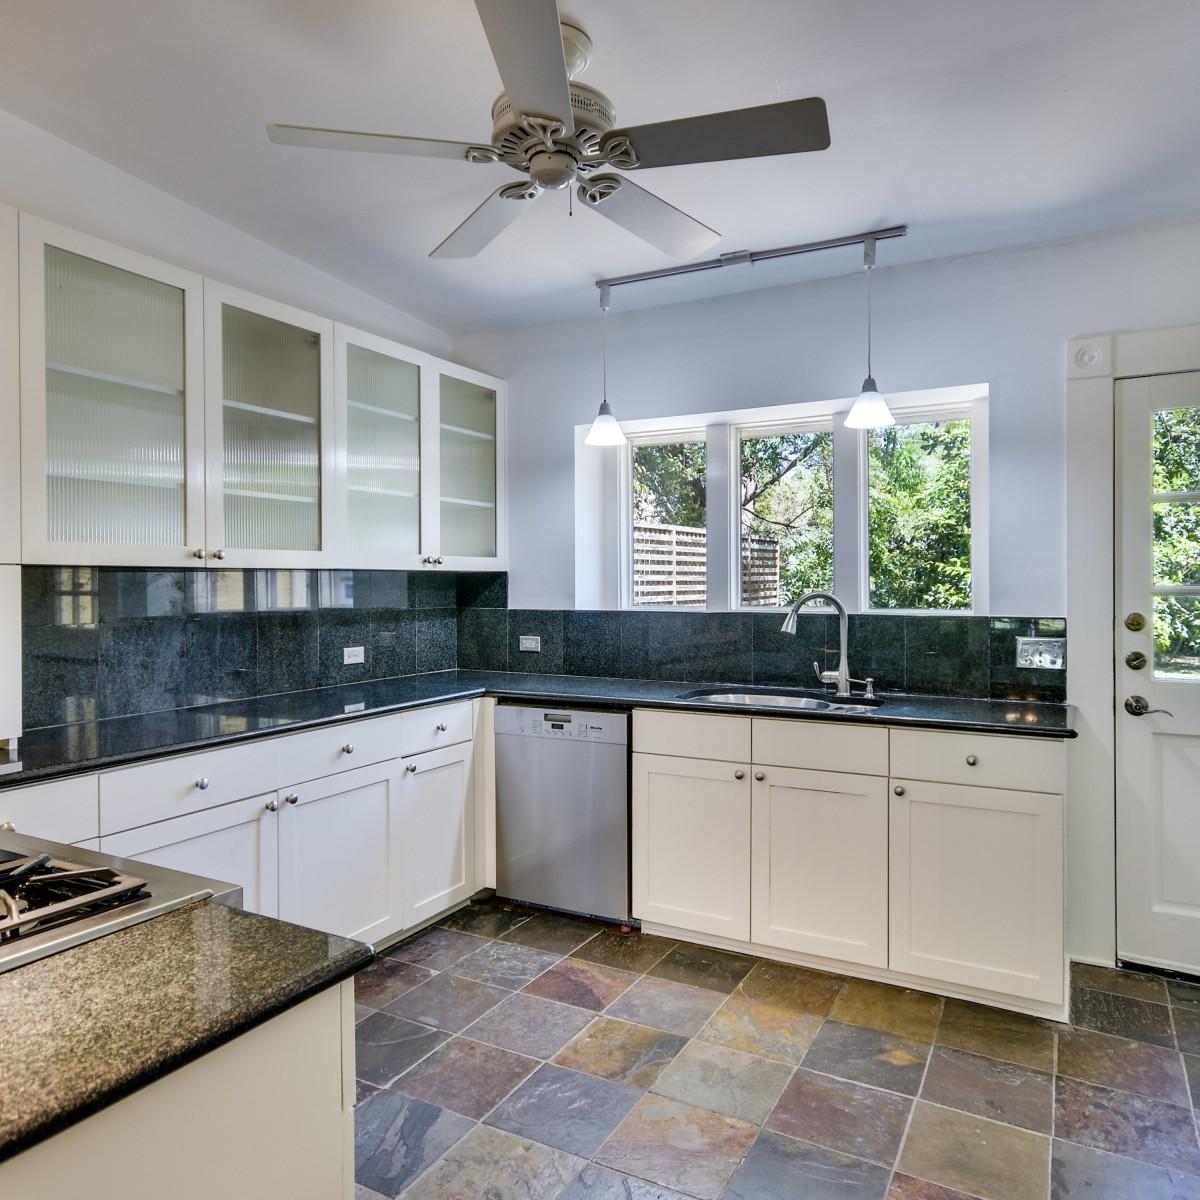 422 Mission San Antonio house for sale kitchen